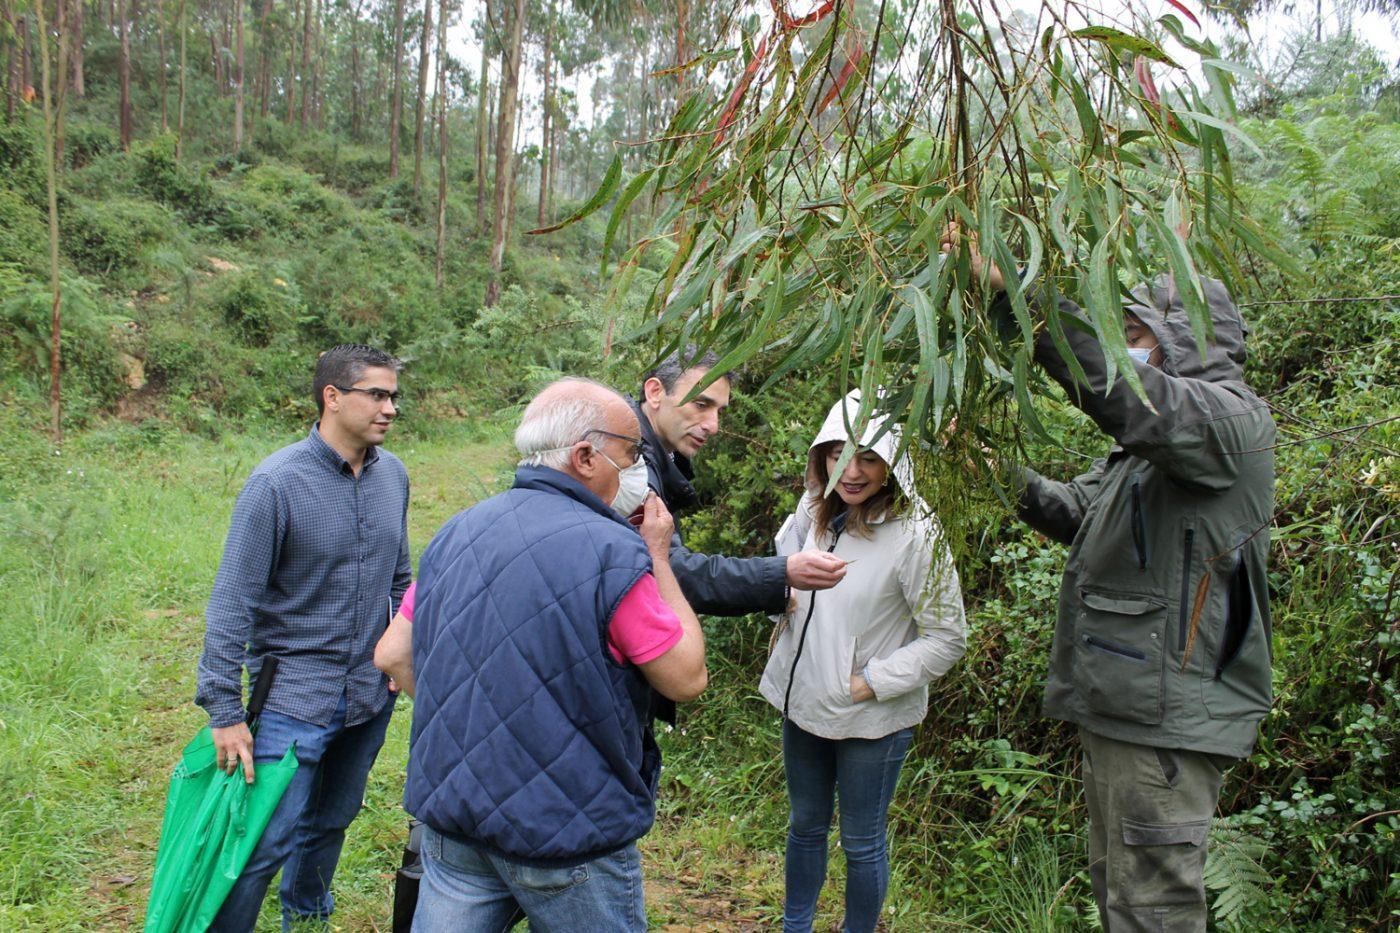 Jornada de formación a propietarios forestales de Cantabria sobre lucha biológica frente al gorgojo del eucalipto